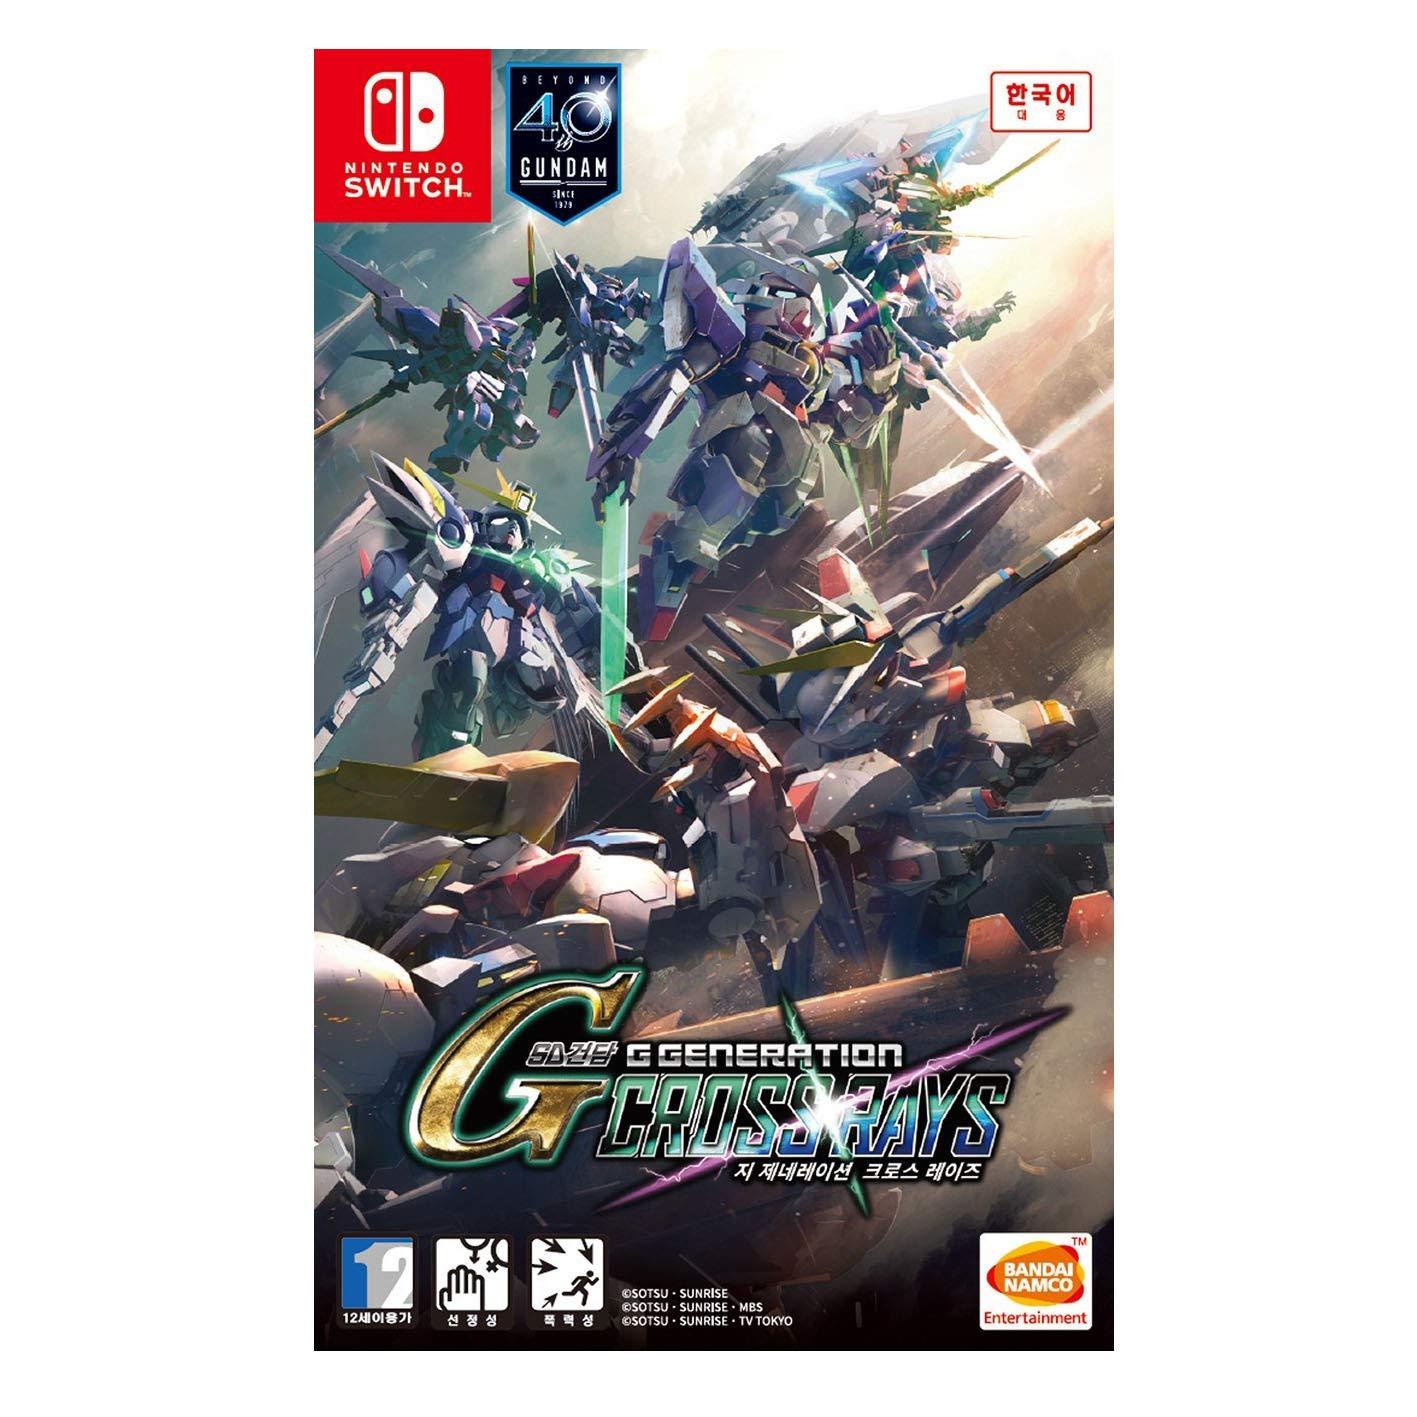 SD Gundam G Generation Cross Rays Korean Edition [English Supports] - Nintendo Switch